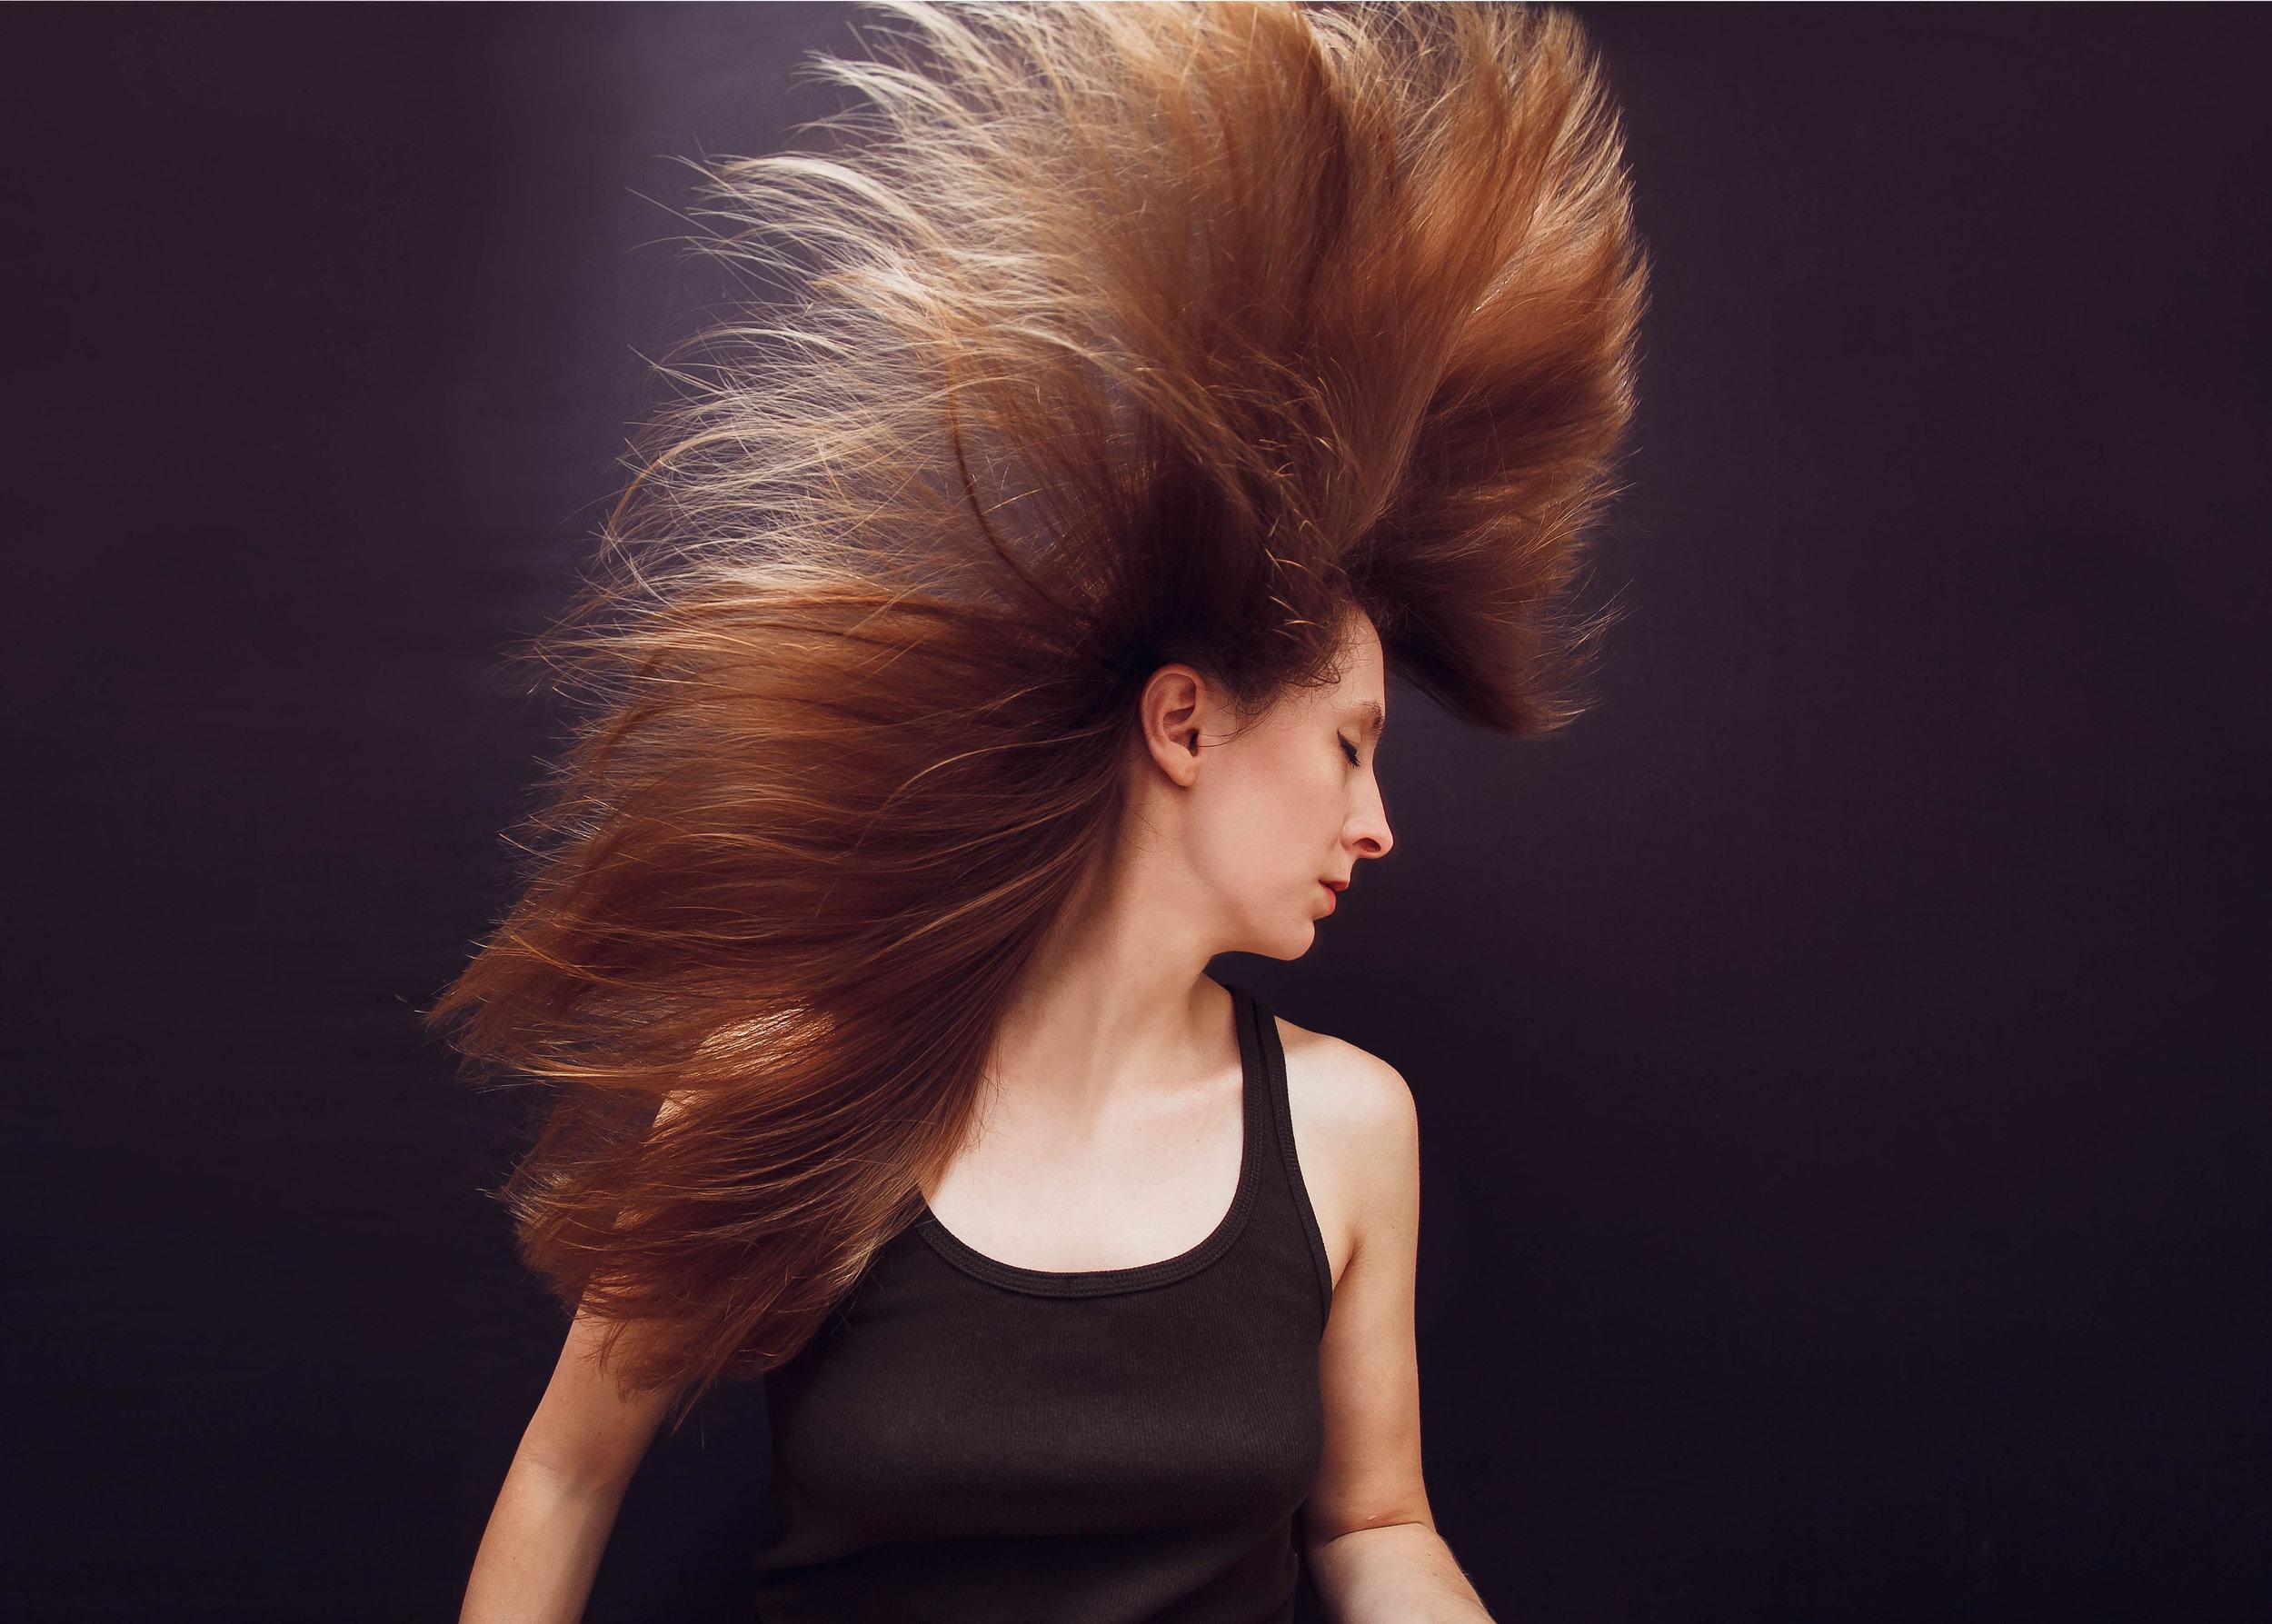 Golden Hair Self Portrait